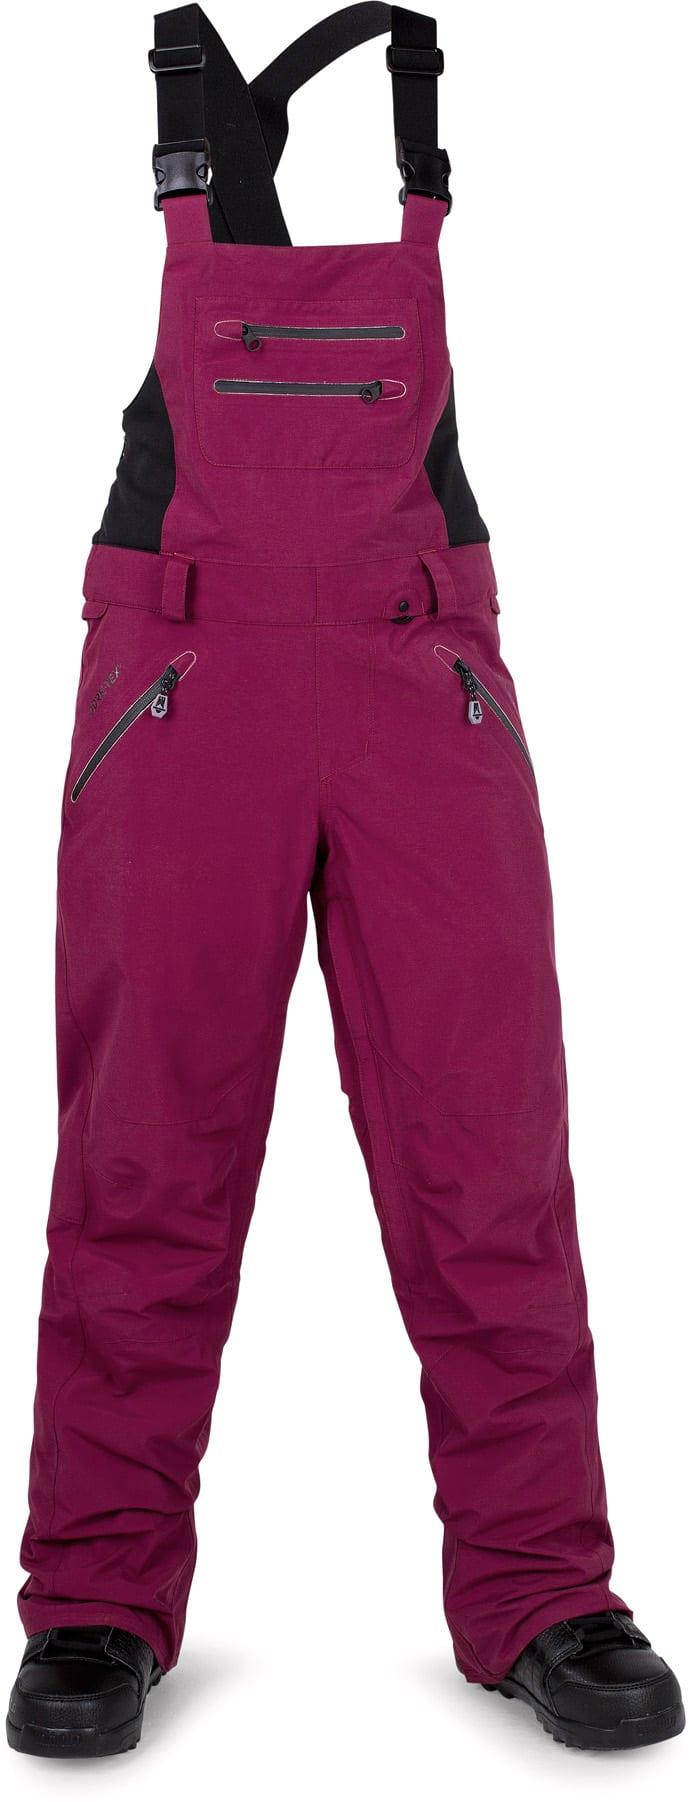 On Sale Volcom Arica Gore Tex Overall Bib Snowboard Pants